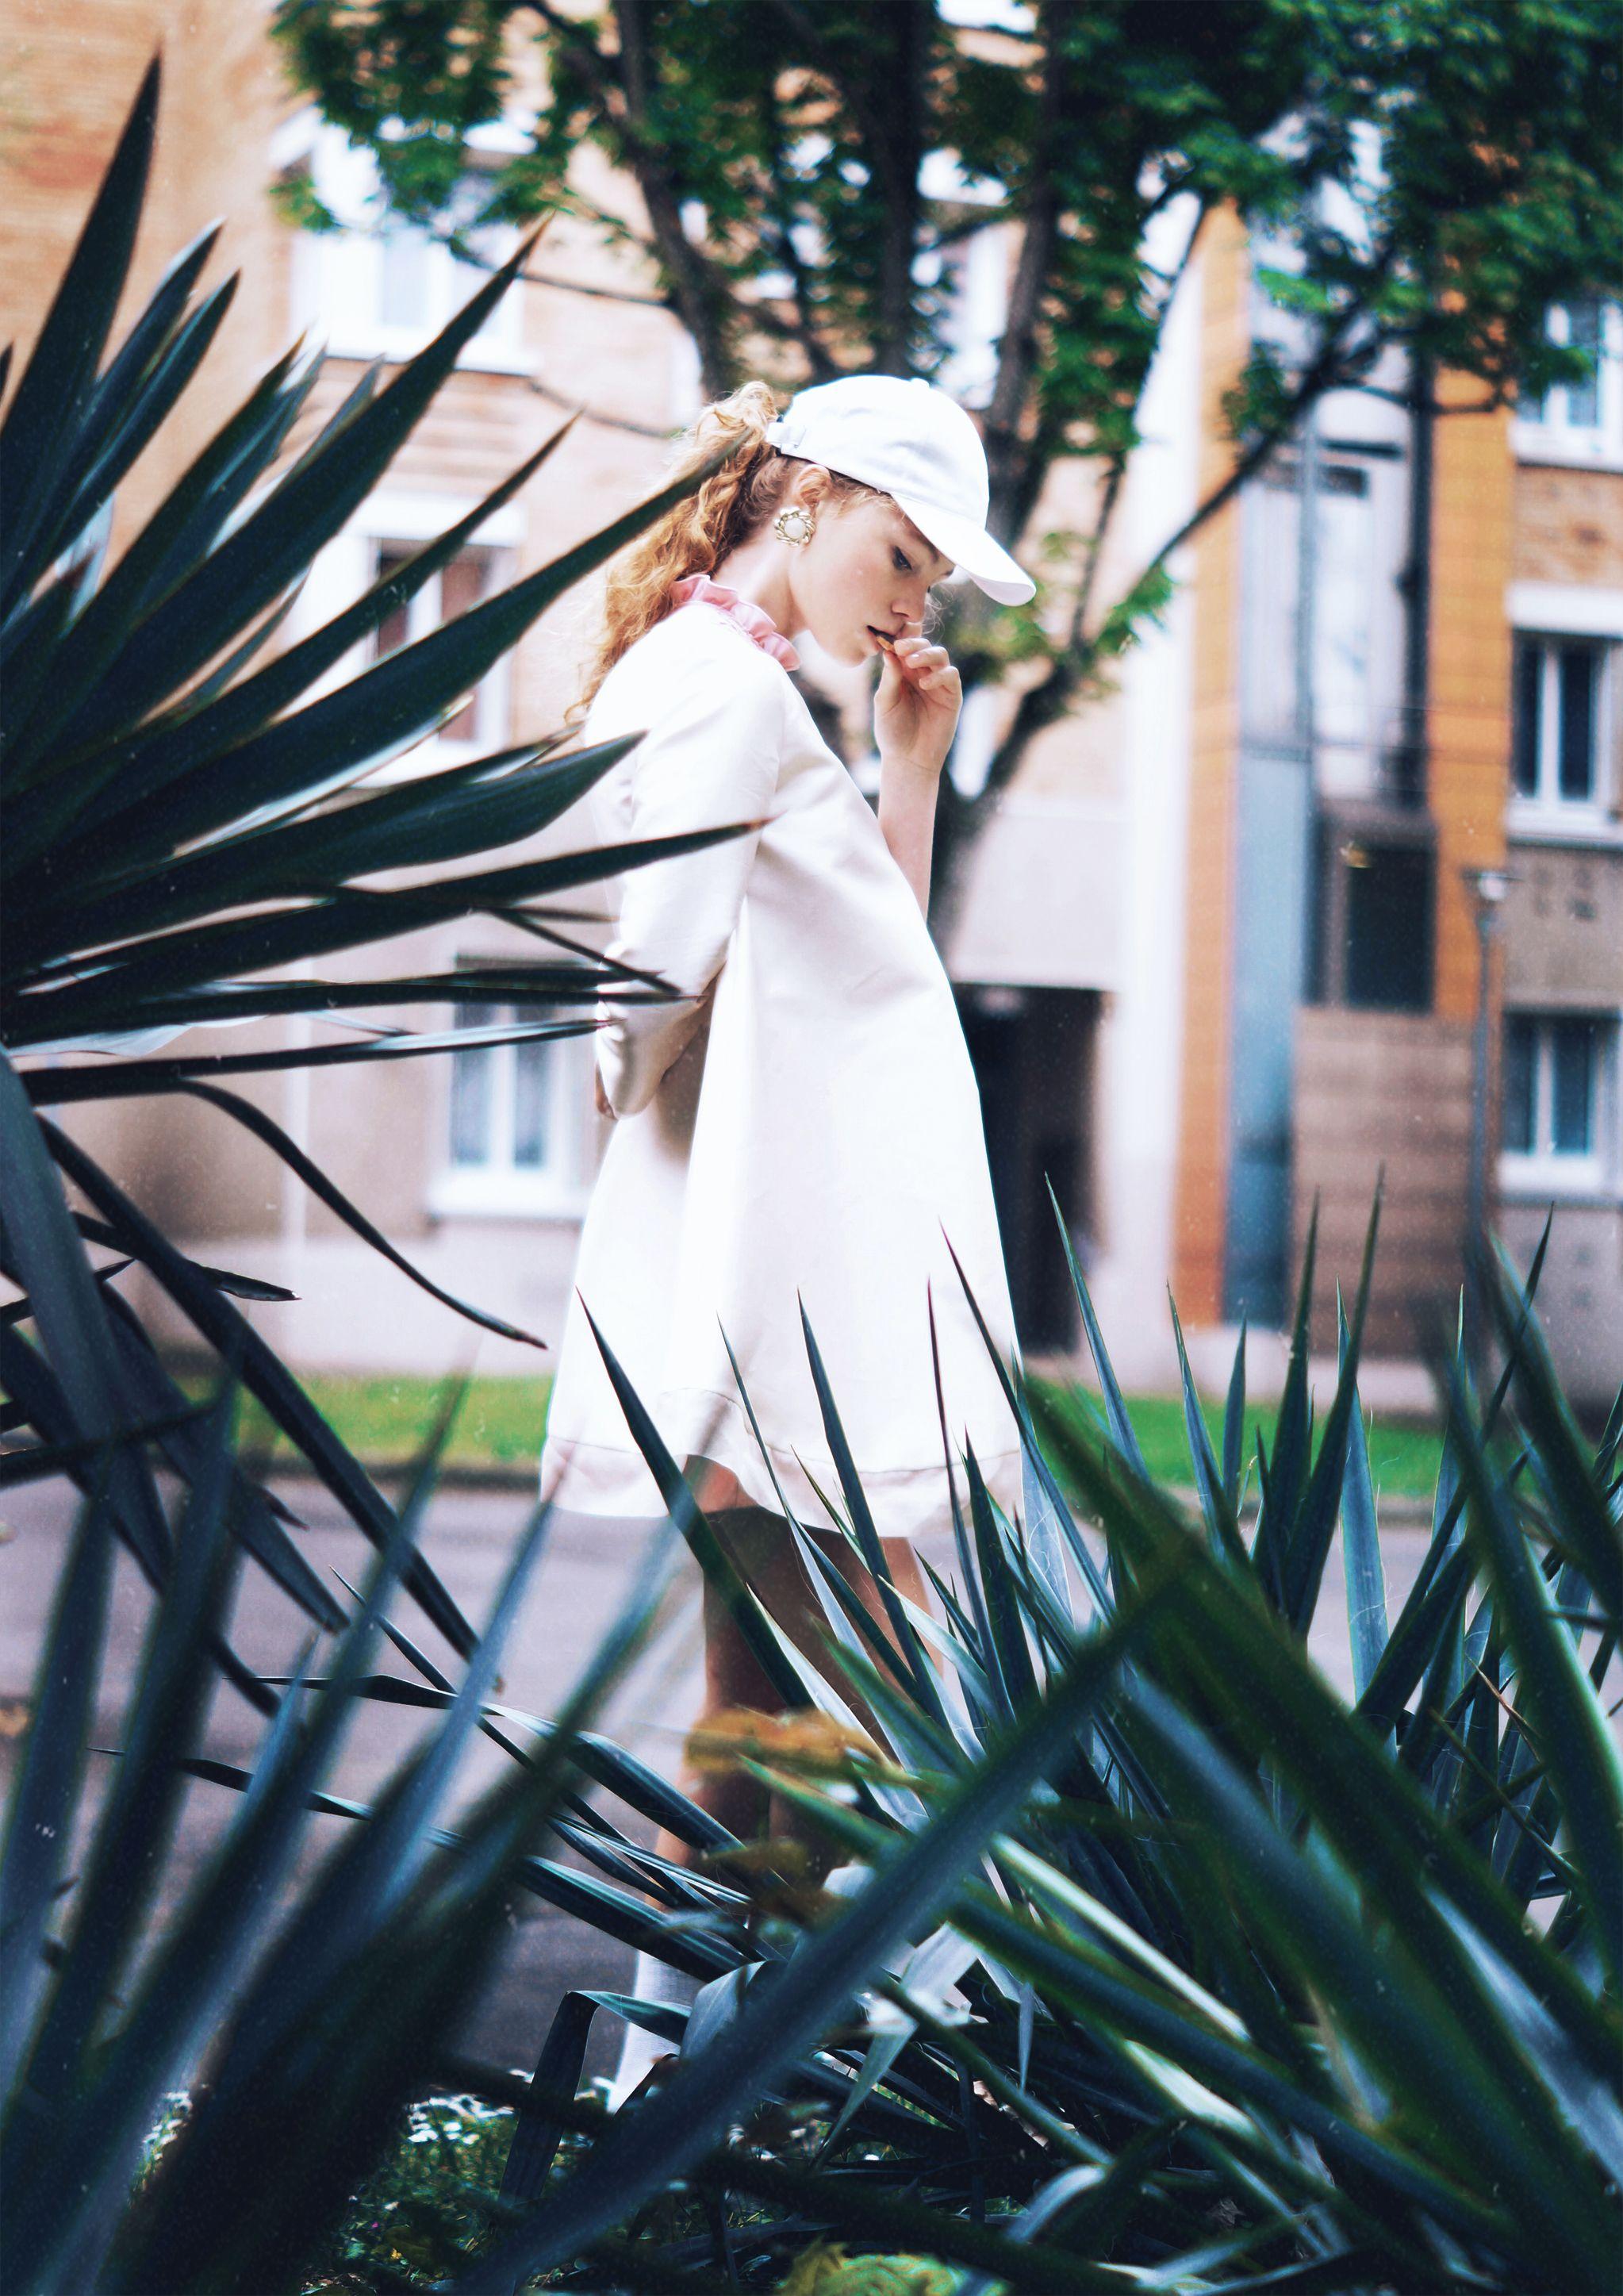 Phtographe: Maïwenn Nicolas  Modèle: Eva Bazin  Stylisme: Léo Rouault  Assistante: Clémence Chatin  Editorial pour le Magazine de Lucy  http://lucysmagazine.com/portfolio/bovarysta/